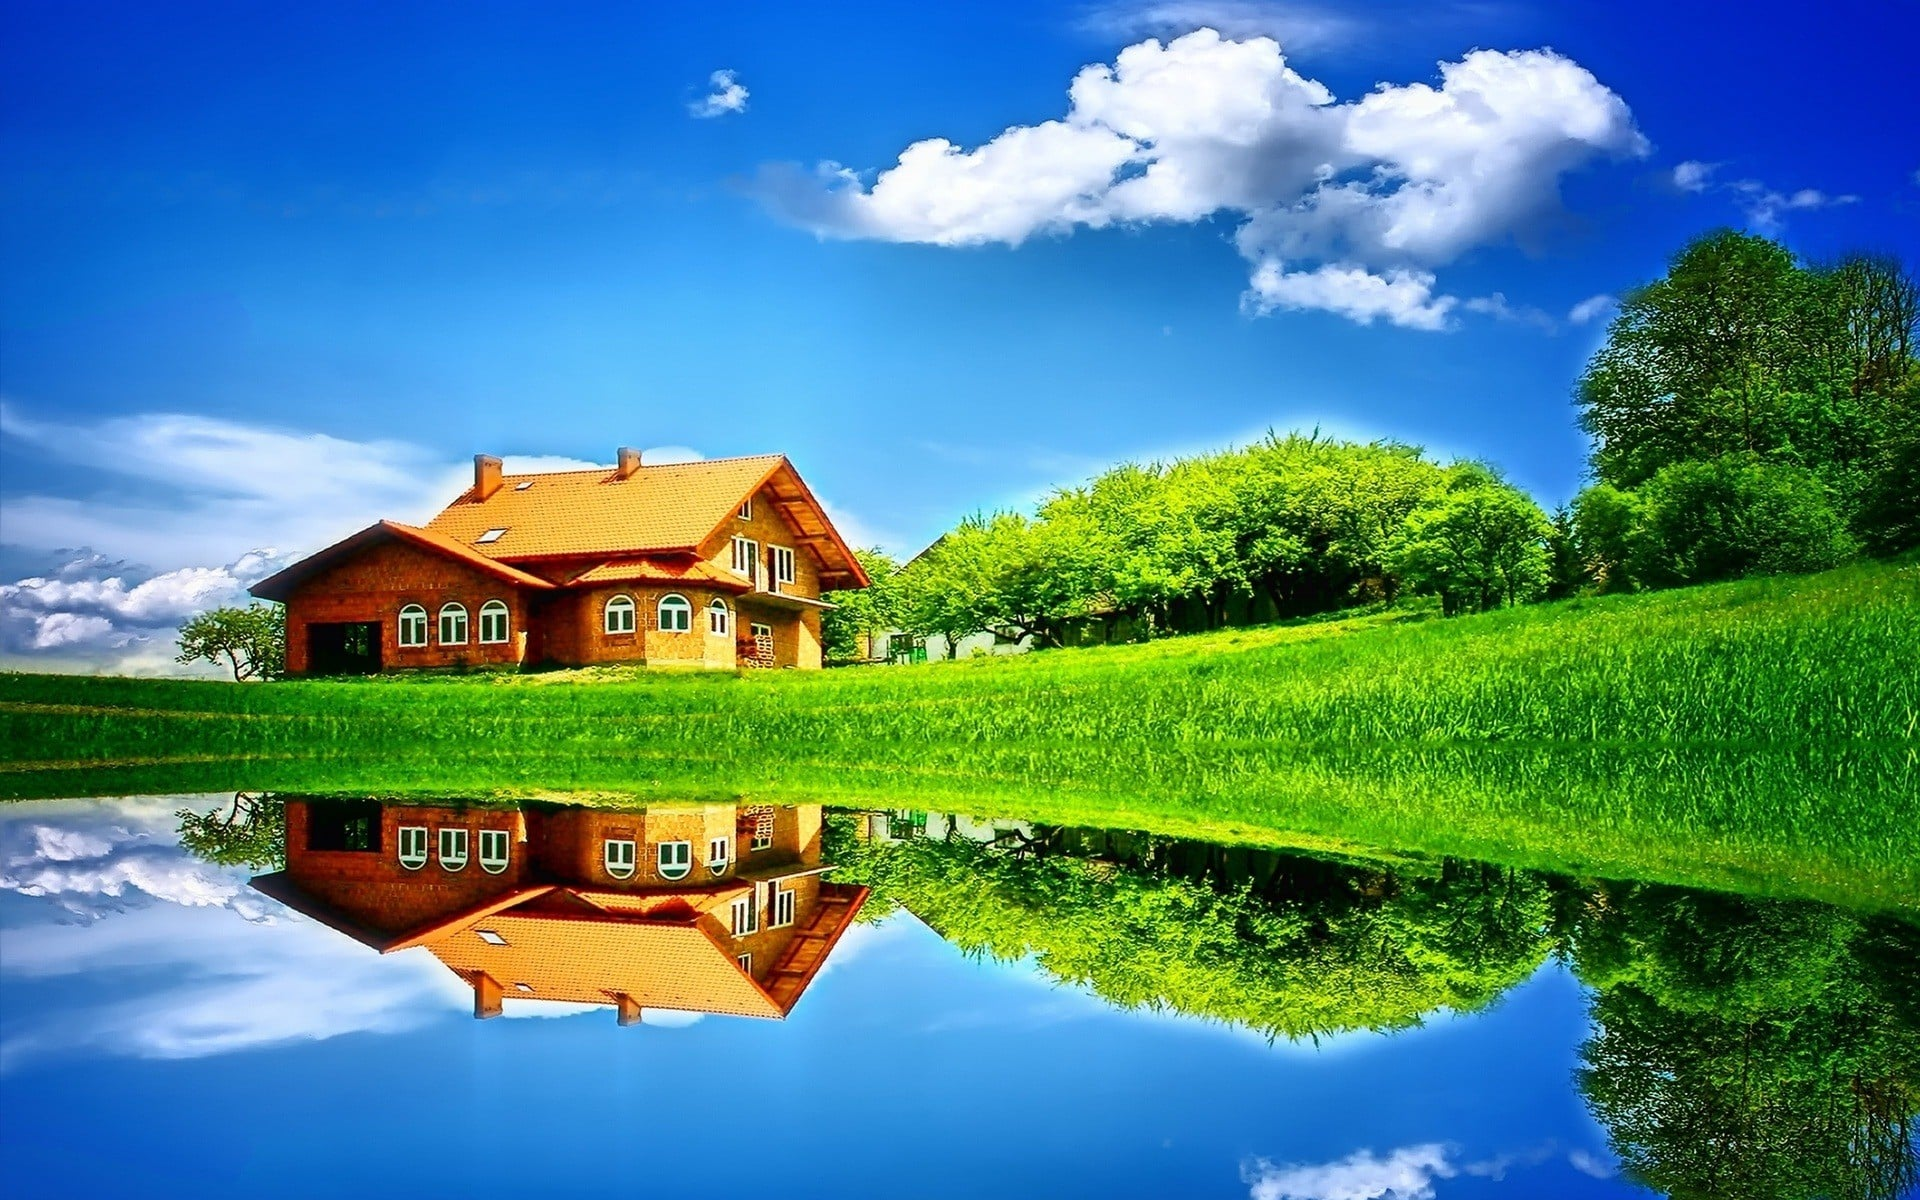 manzara ve ev